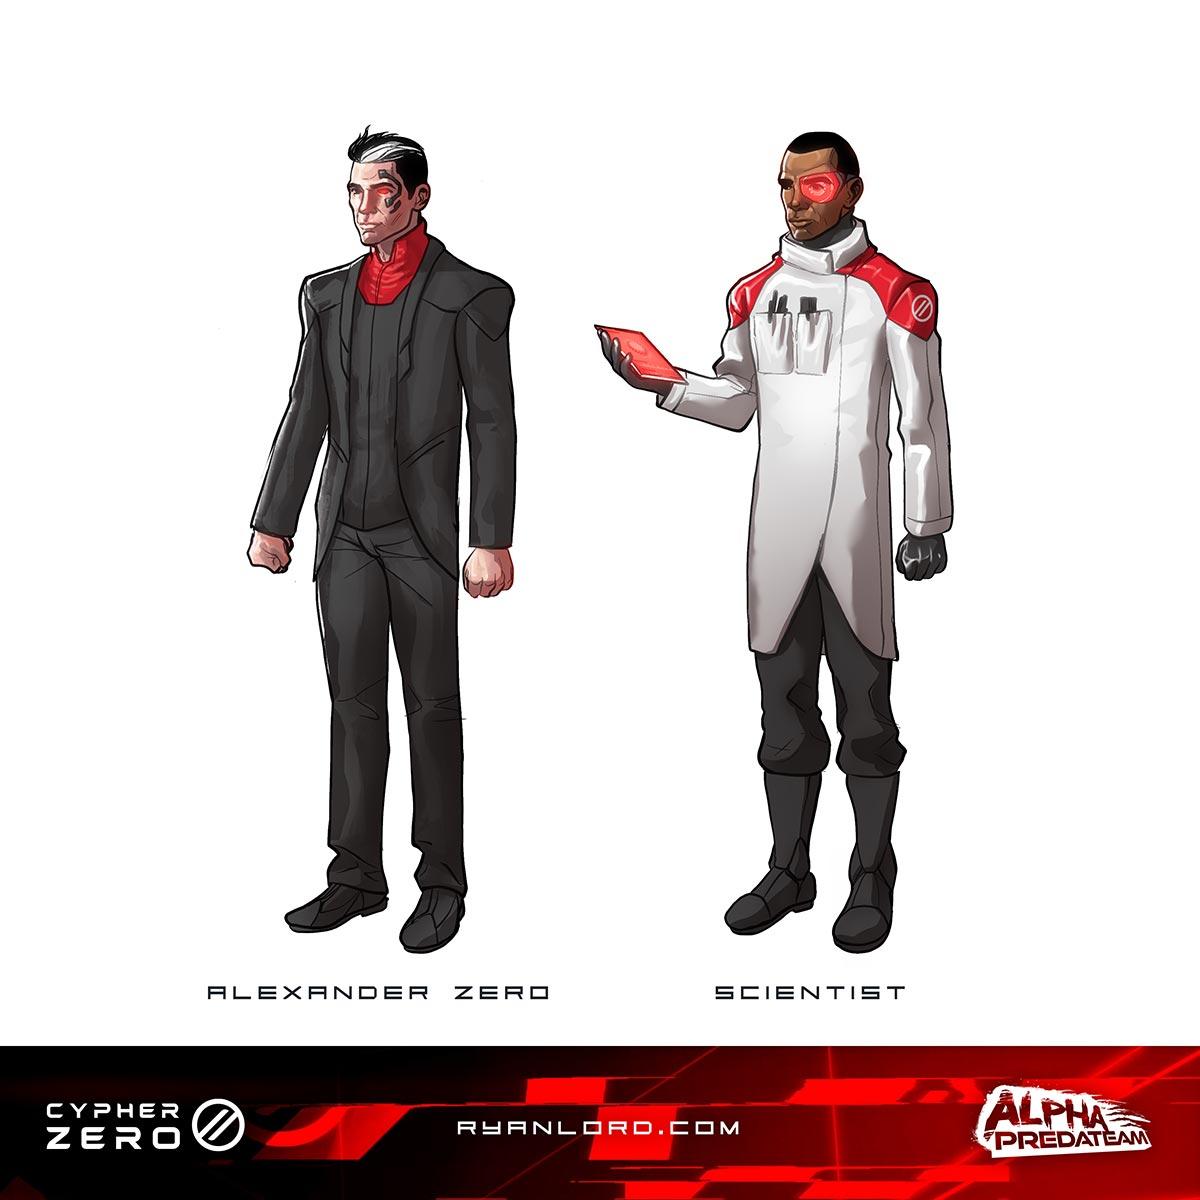 CypherZero Characters